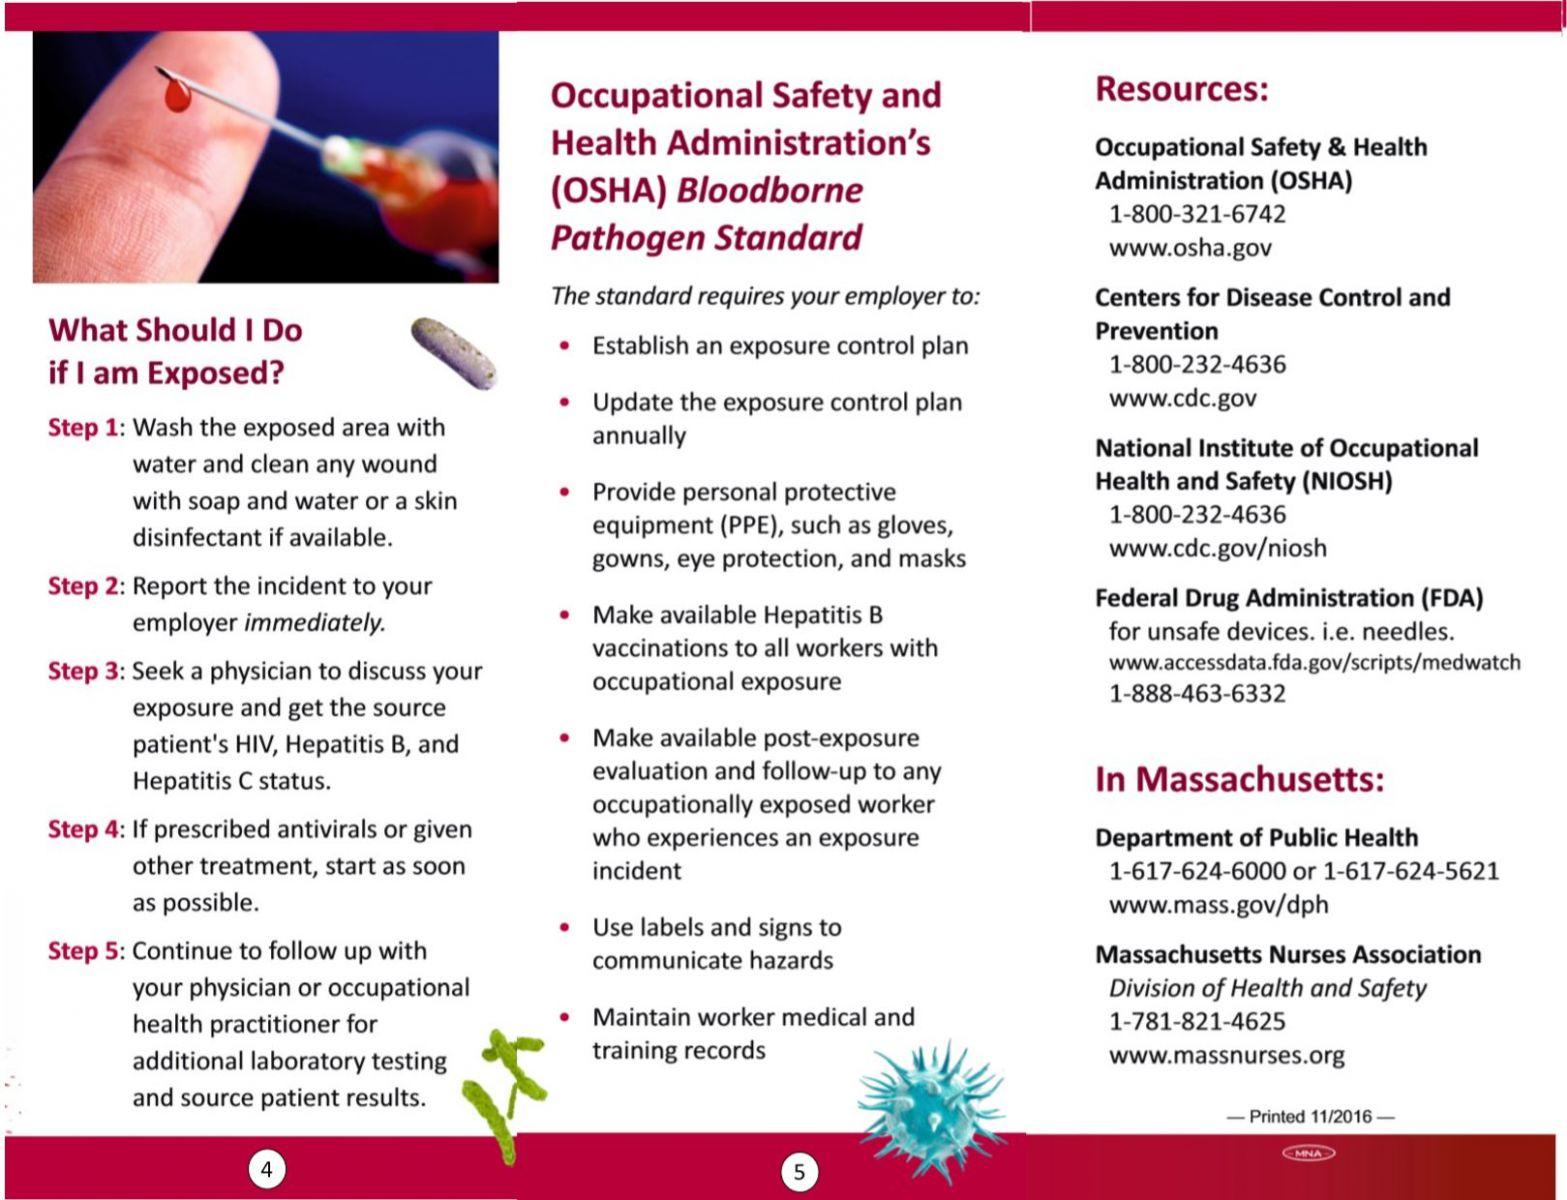 Bloodborne Pathogens - Articles - Health & Safety - Massachusetts Nurses  Association